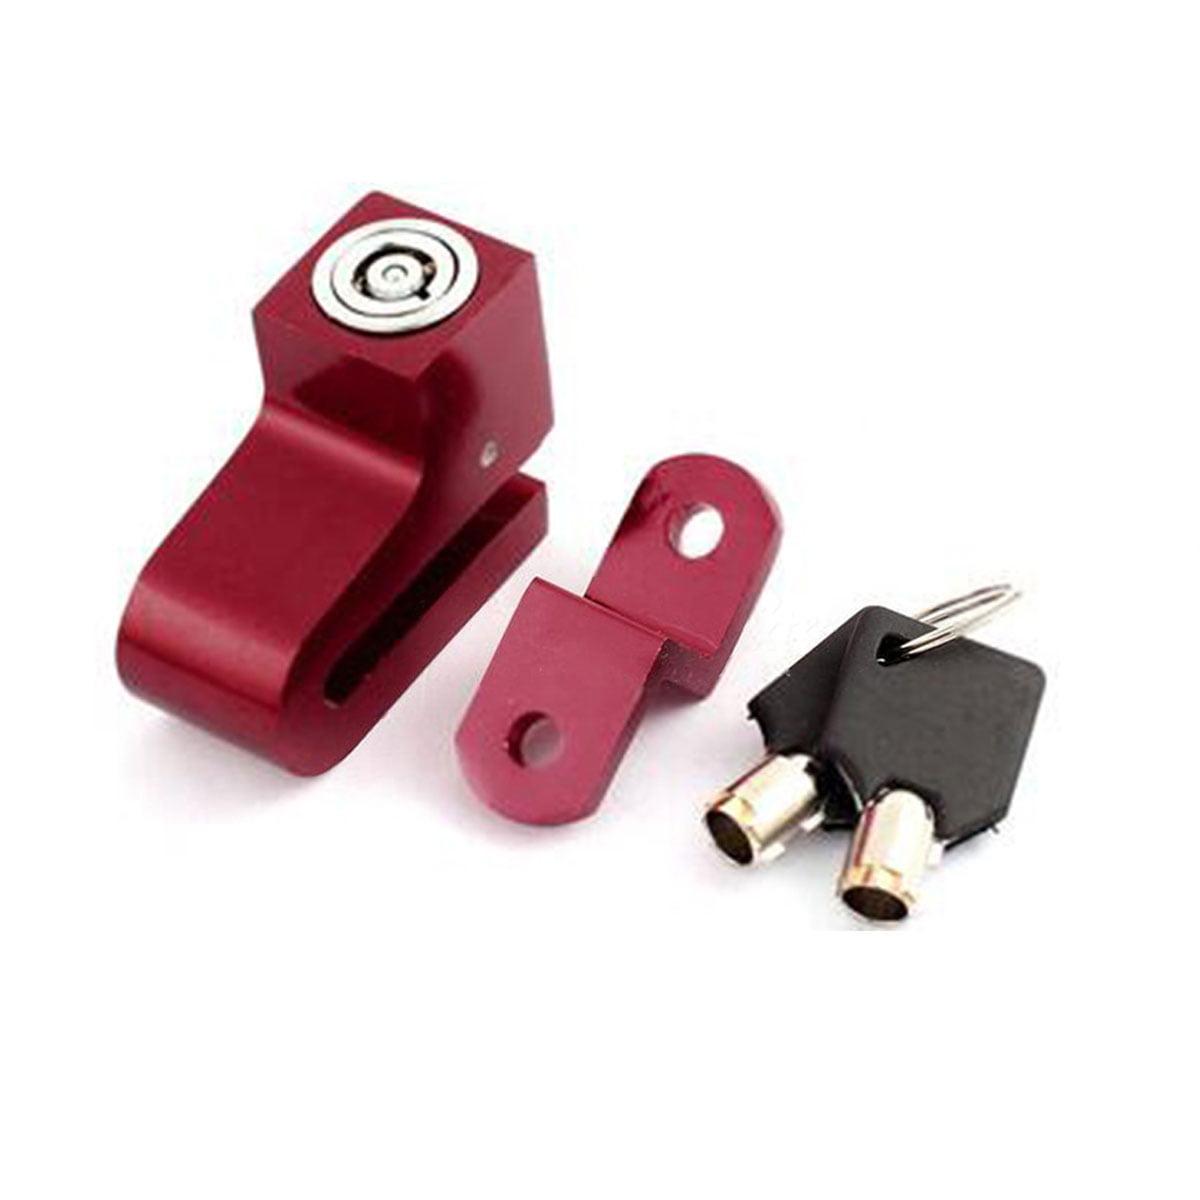 Scooter Security Anti-Theft Metal Disk Brake Wheel Lock - Red